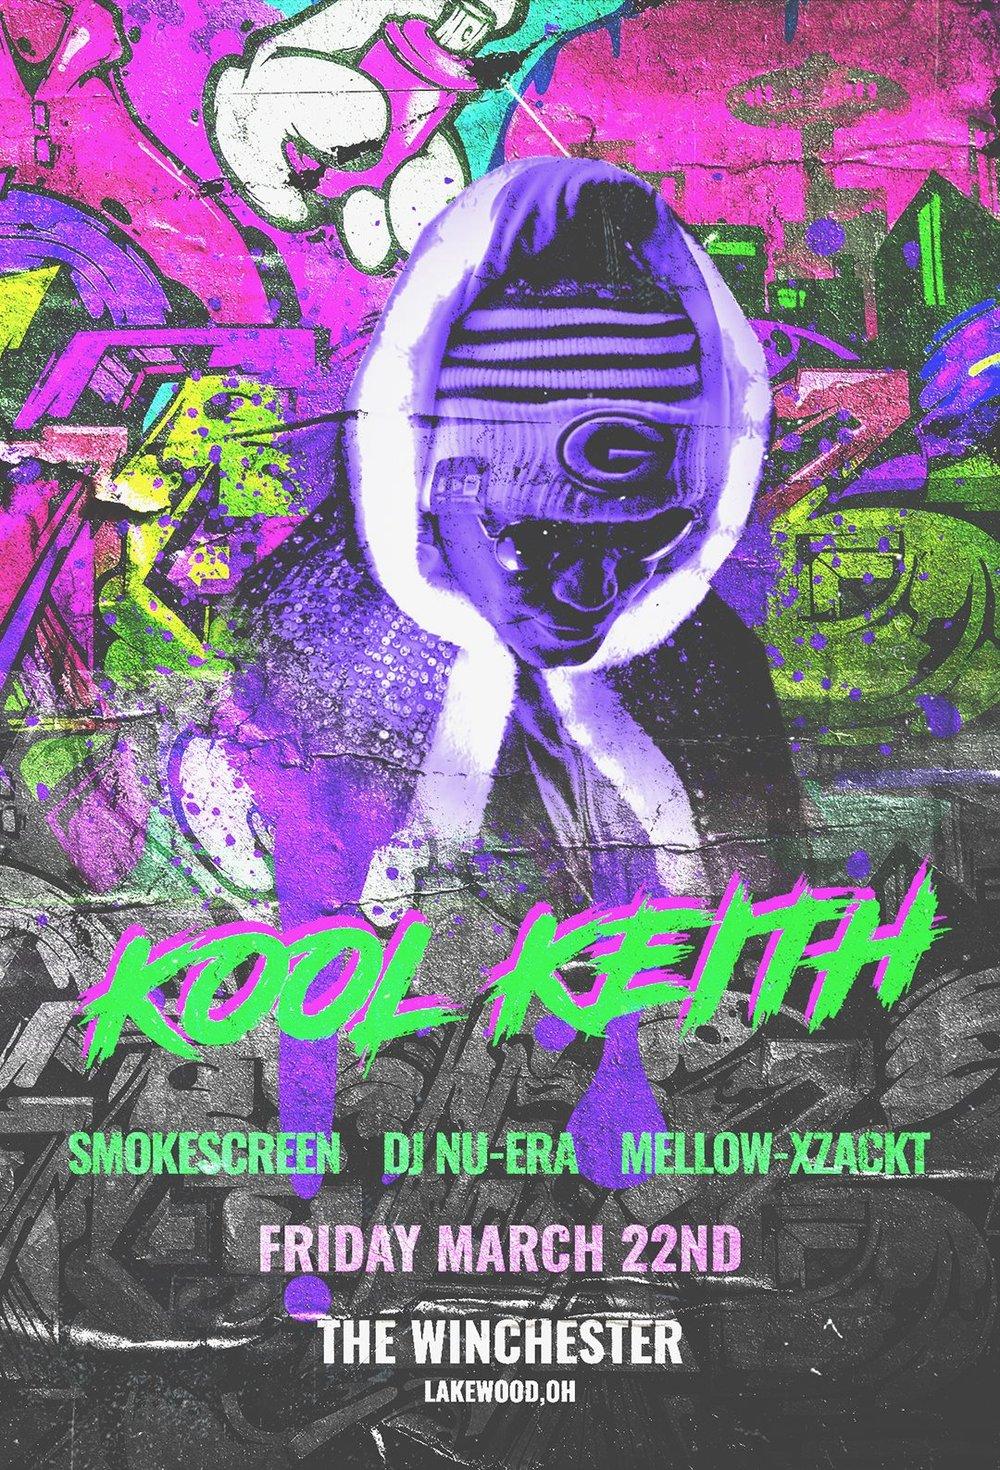 Kool Keith - SmokeScreen DJ Nu•ERA MELLOW-XZACKT